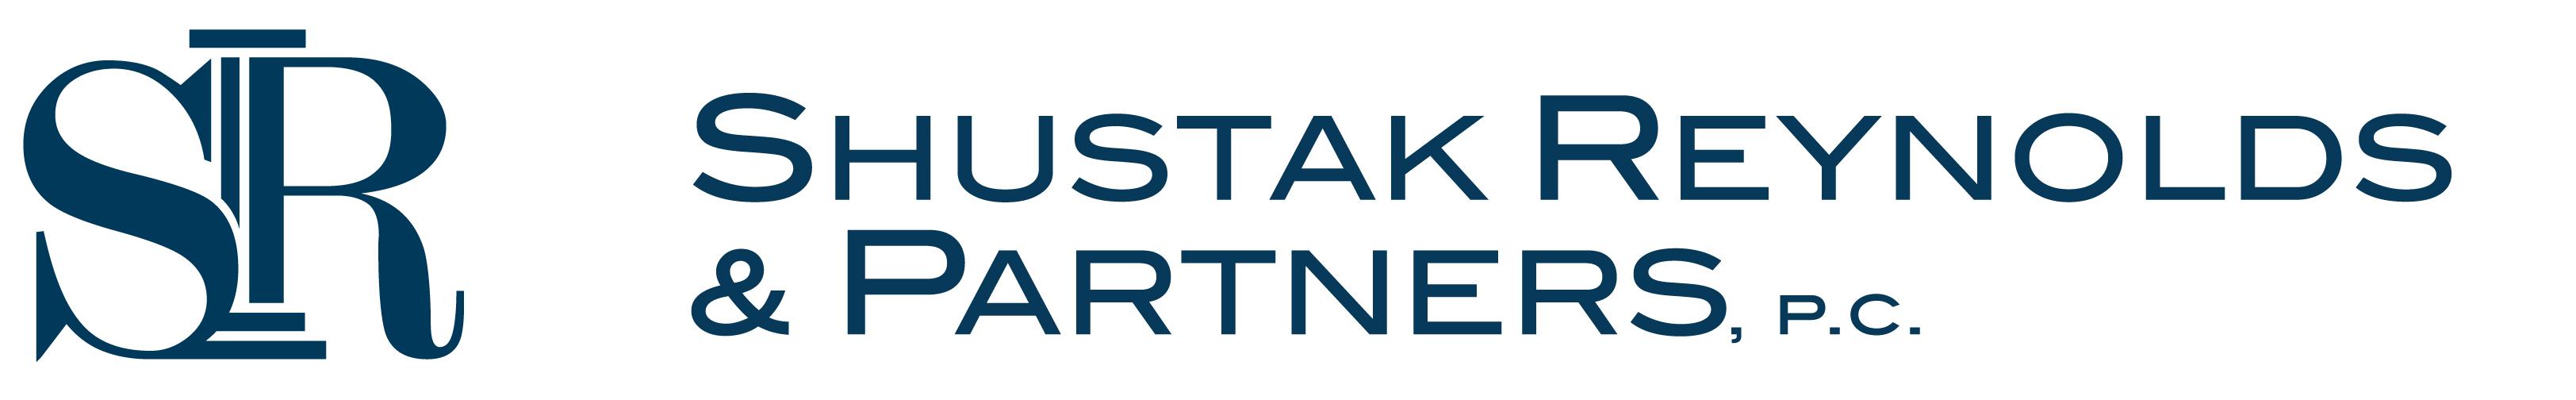 Shustak Reynolds & Partners, P.C logo